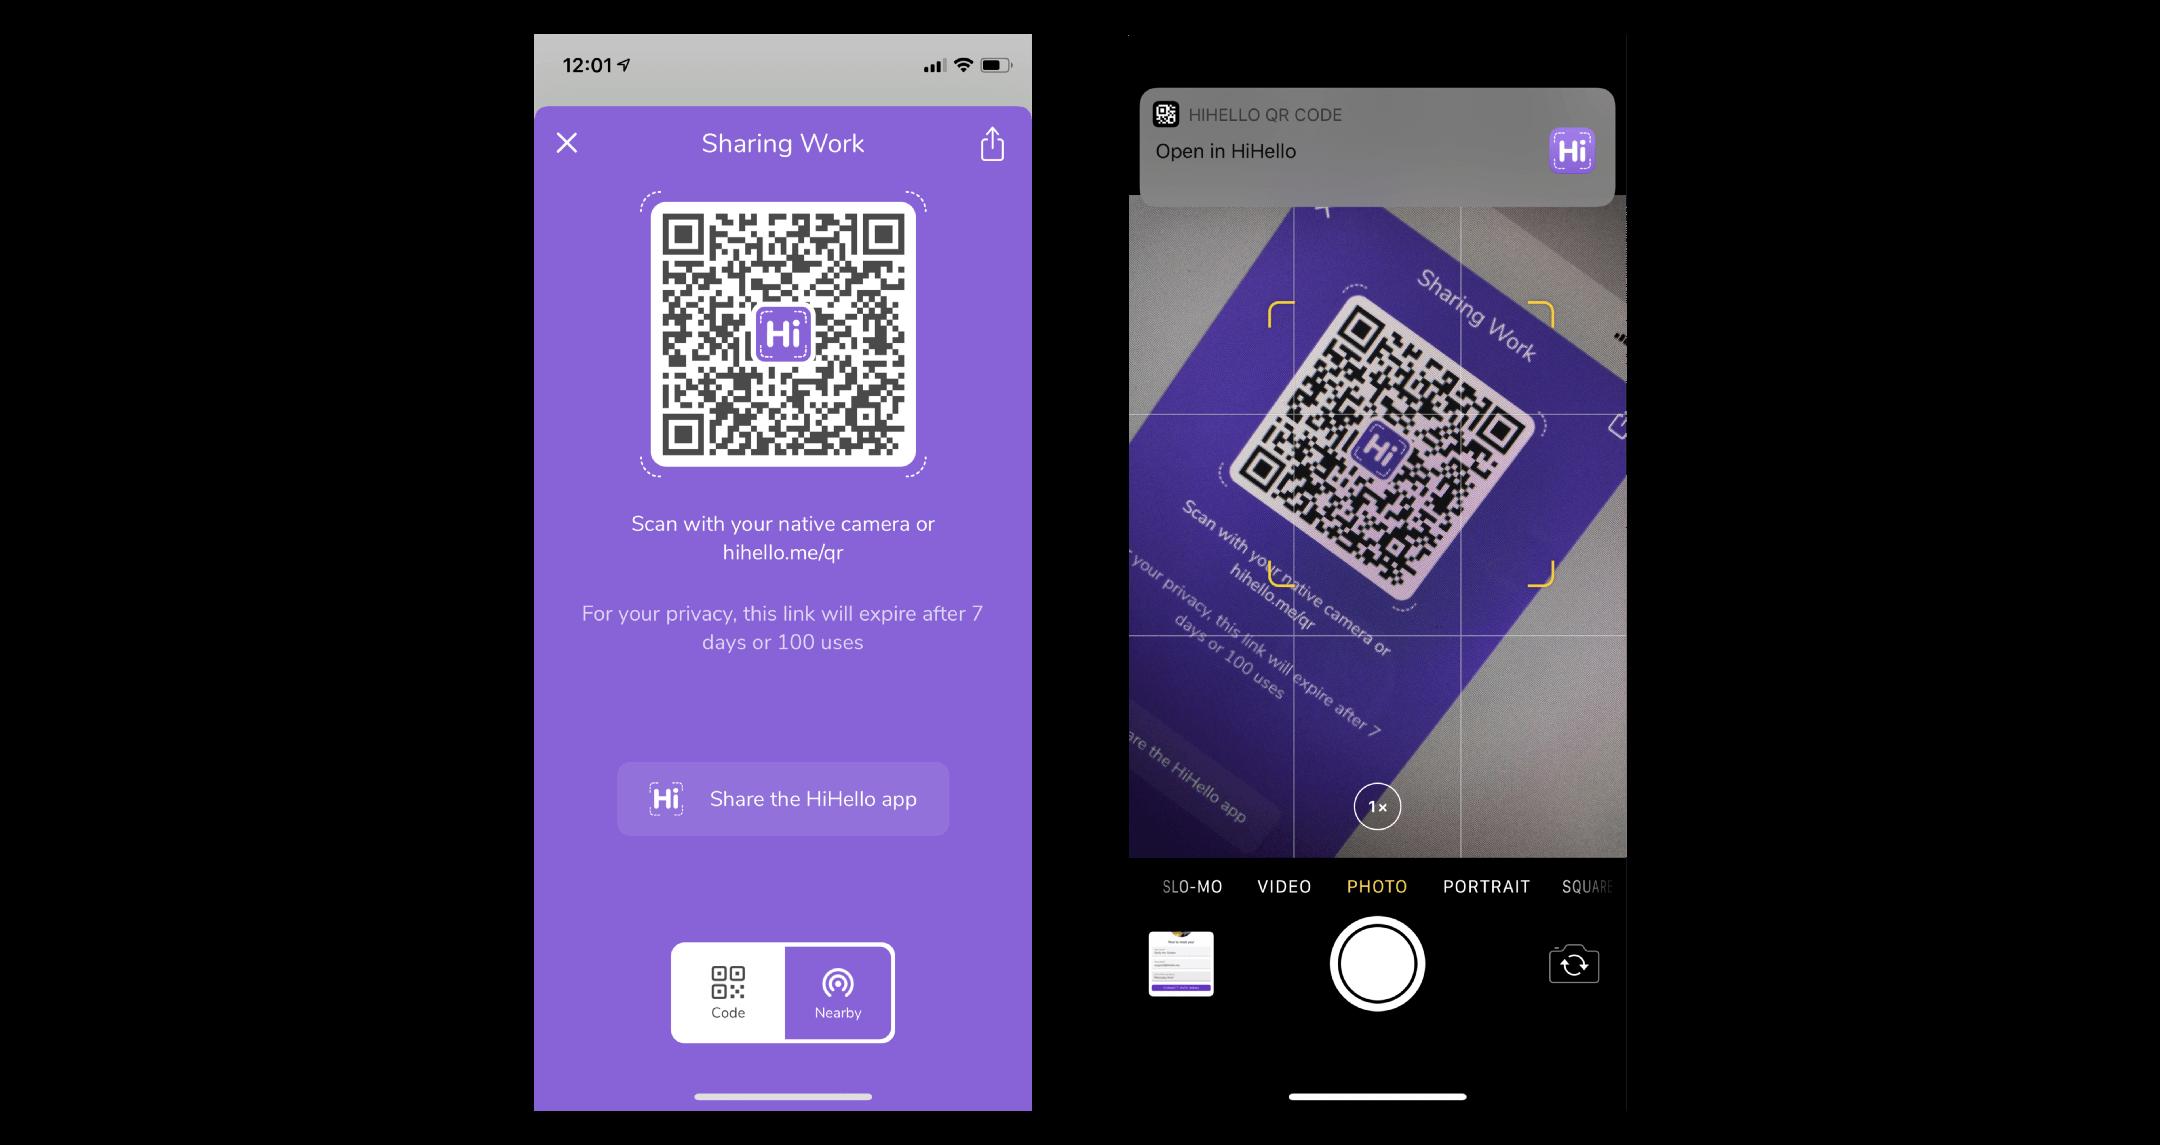 Phone scanning a HiHello QR code